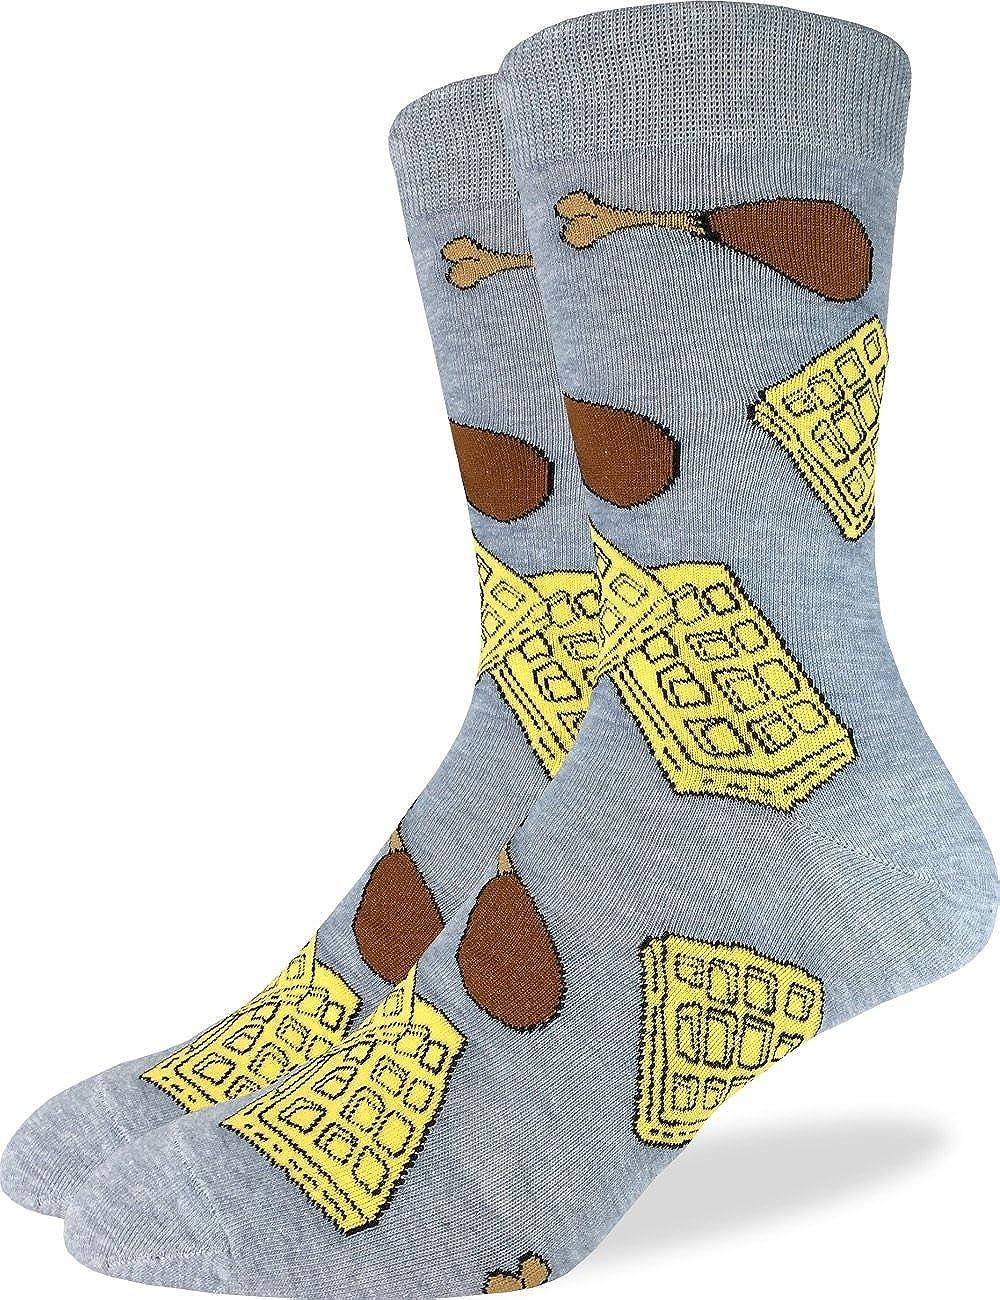 Good Luck Sock Men's Chicken & Waffles Crew Socks - Grey, Shoe Size 7-12 1324